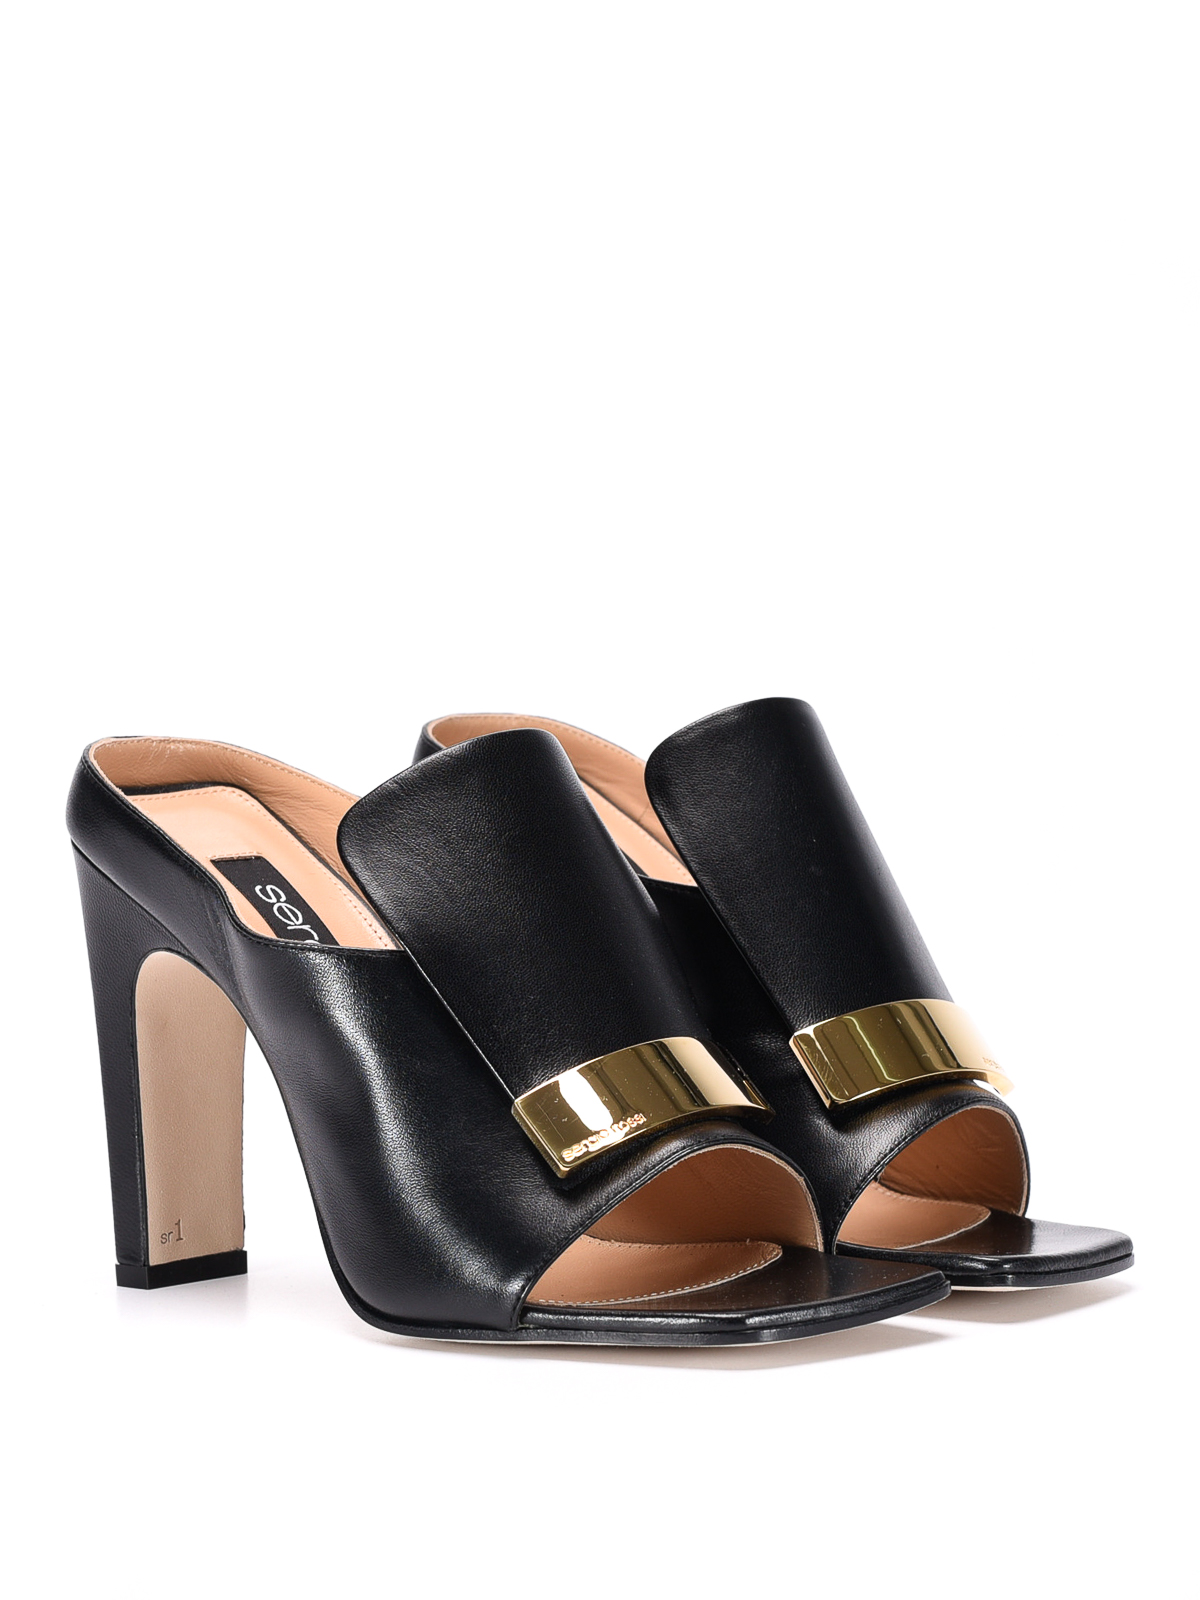 High Heel Shoes For Men Online Shopping